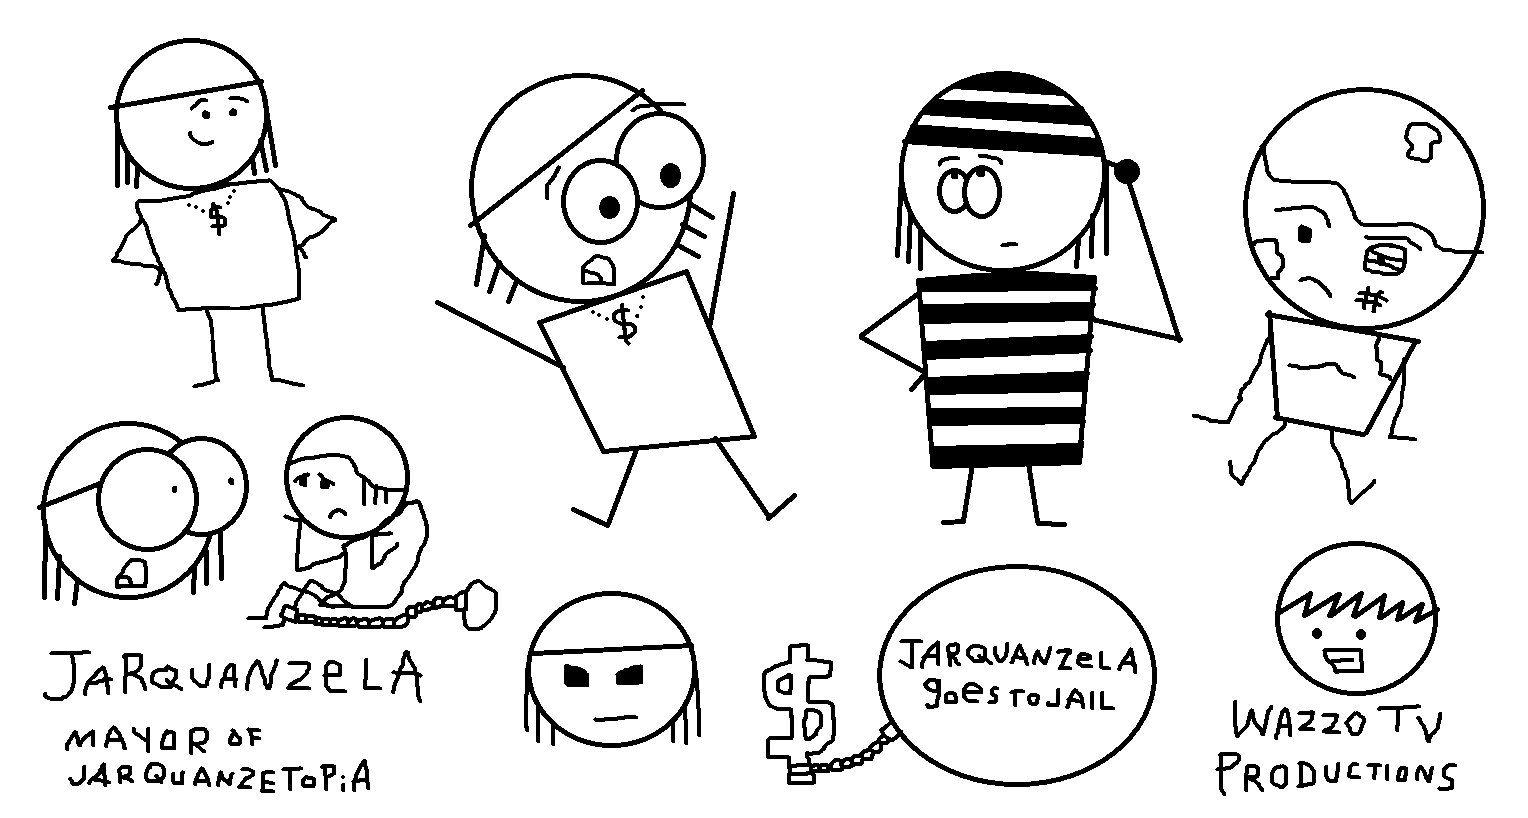 Jarquanzela Goes to Jail